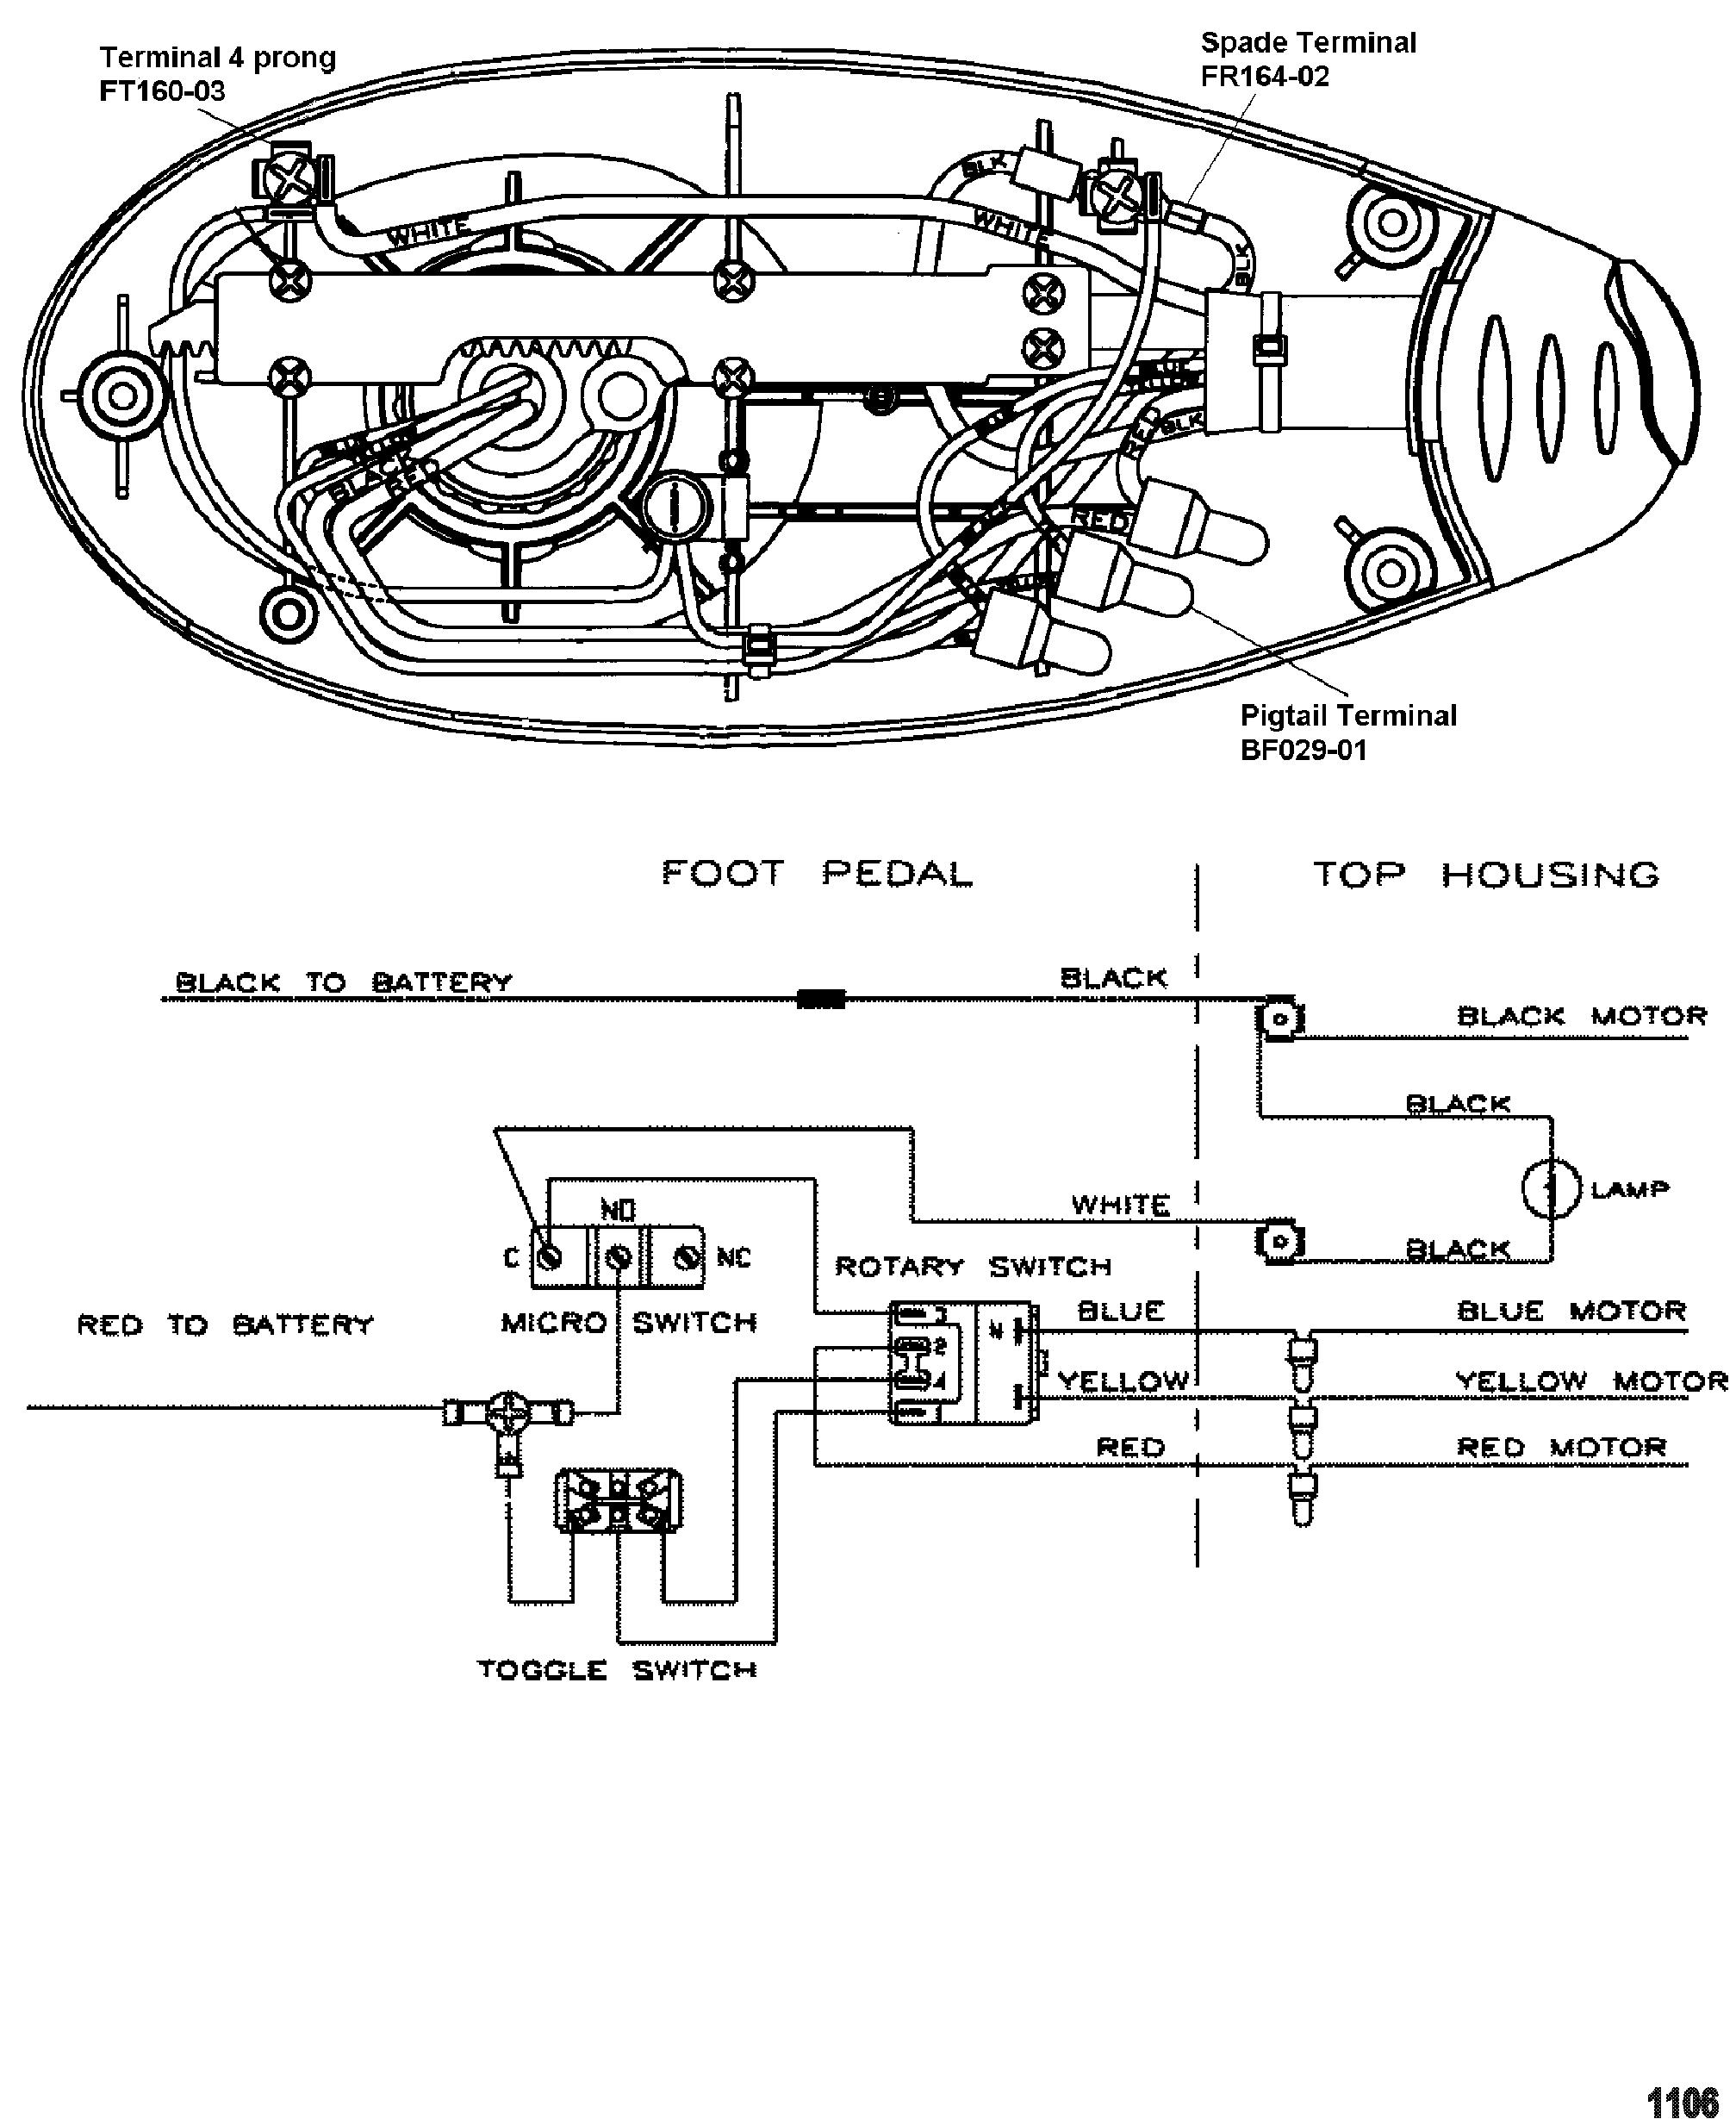 mercury outboard engine diagrams mercury motorguide energy series all   up wire diagram  mercury motorguide energy series